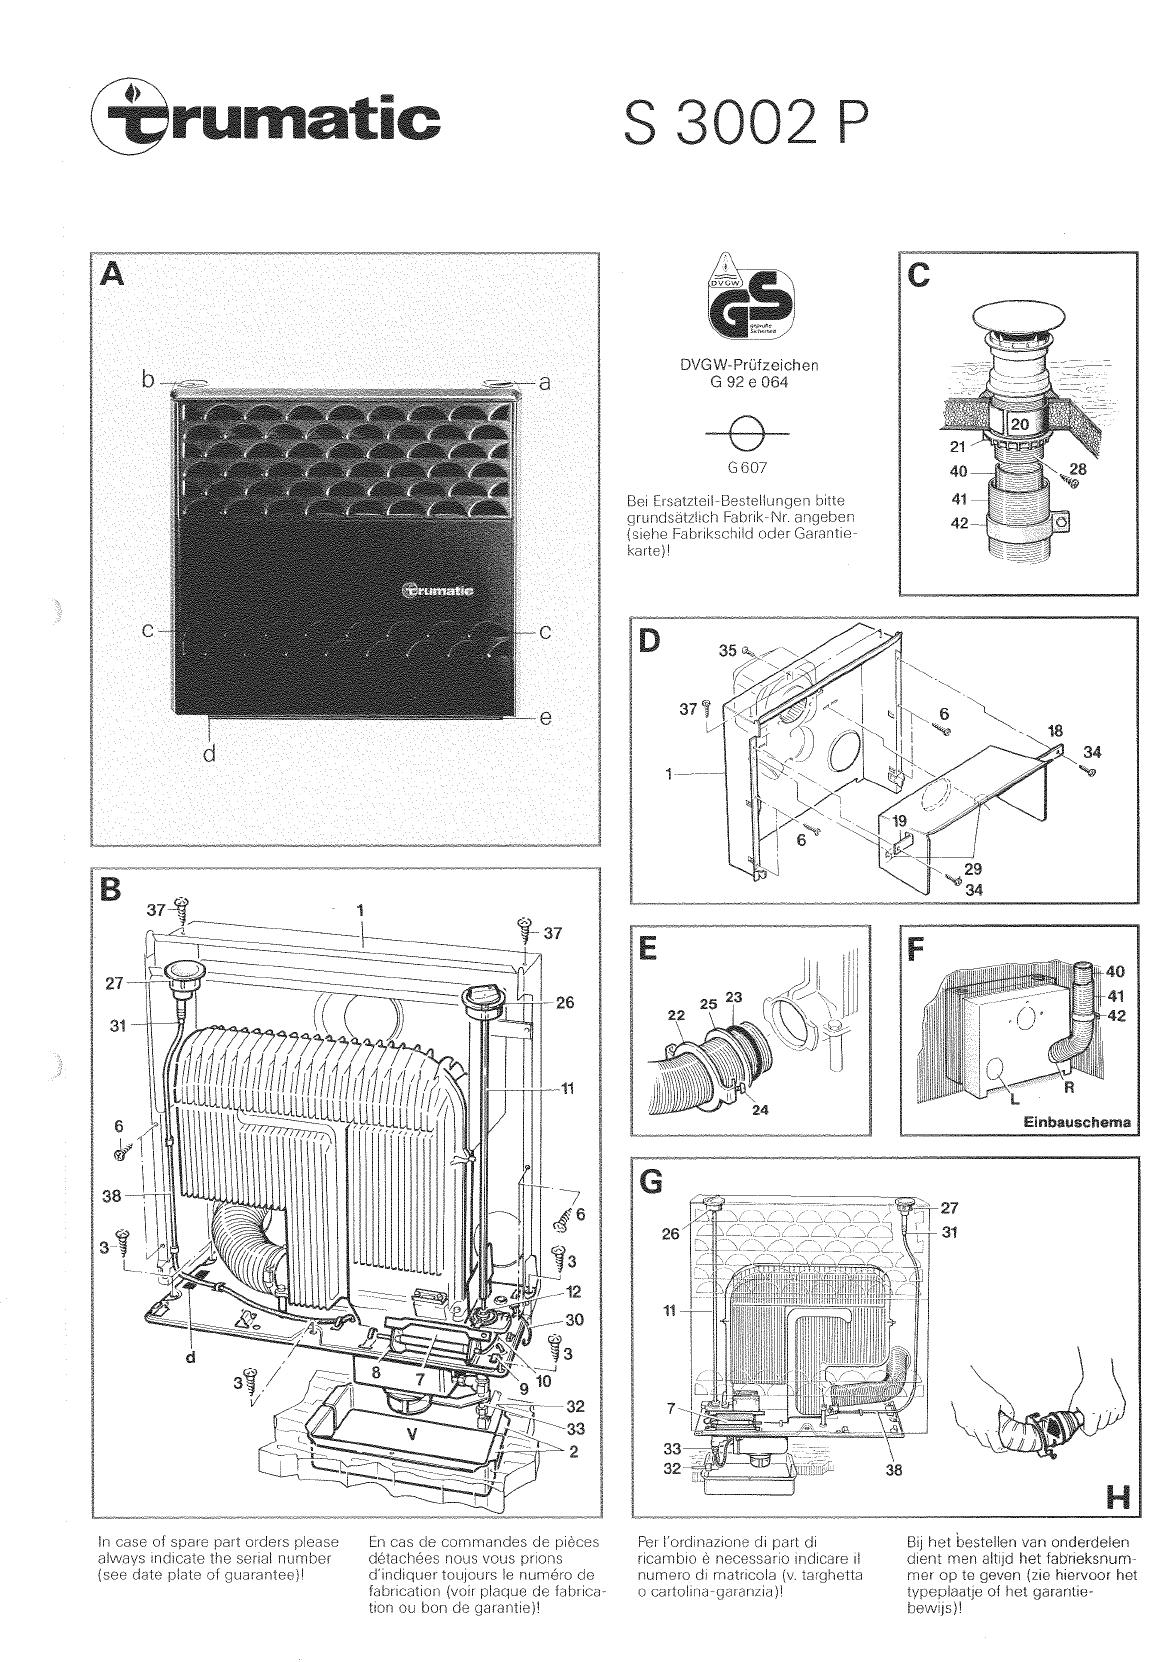 handleiding trumatic s3002p pagina 3 van 18 deutsch. Black Bedroom Furniture Sets. Home Design Ideas